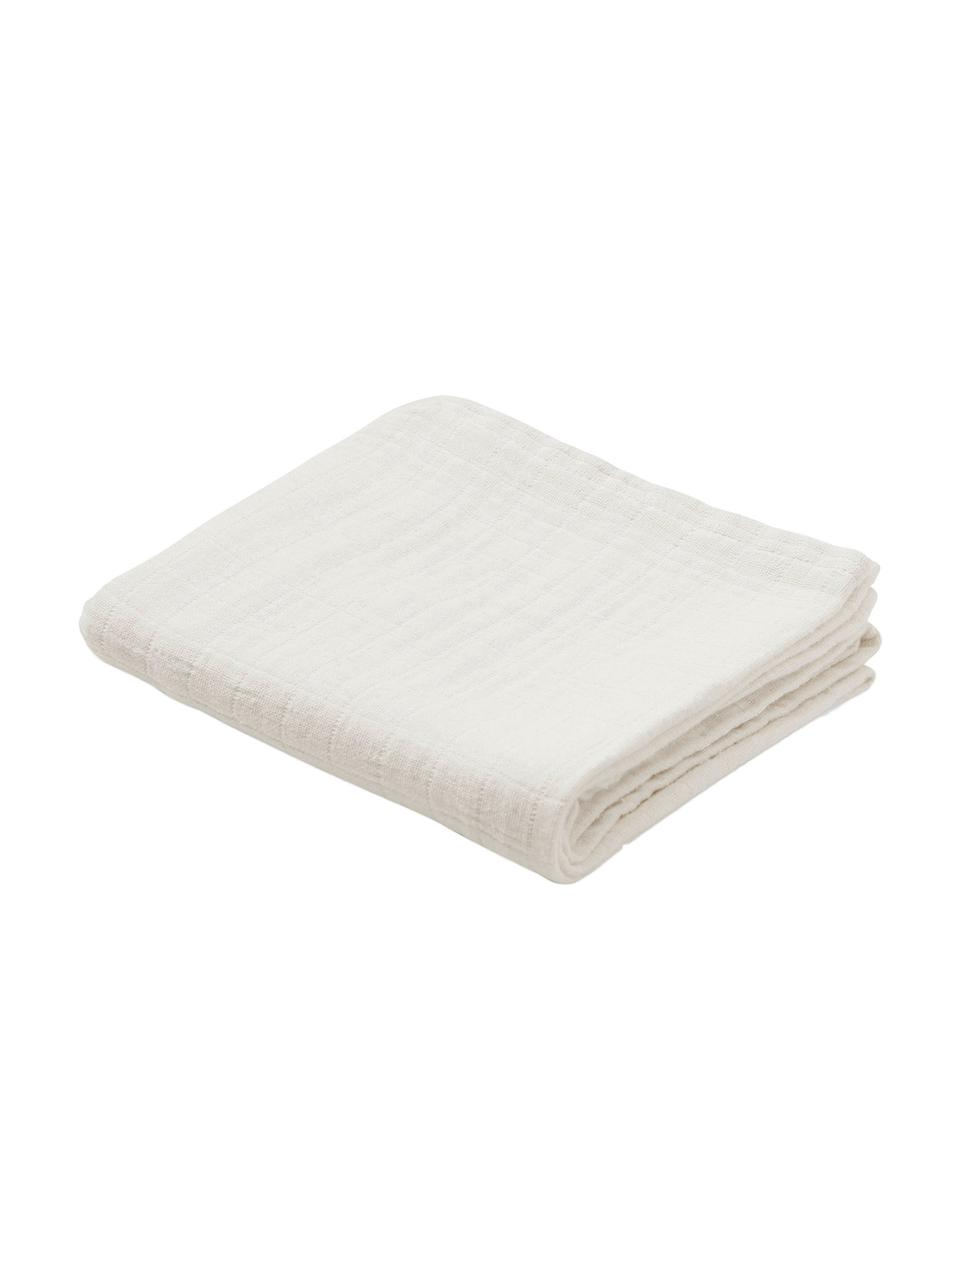 Mulltücher Muslin aus Bio-Baumwolle, 2 Stück, 100% Biobaumwolle, GOTS-zertifiziert, Creme, 70 x 70 cm